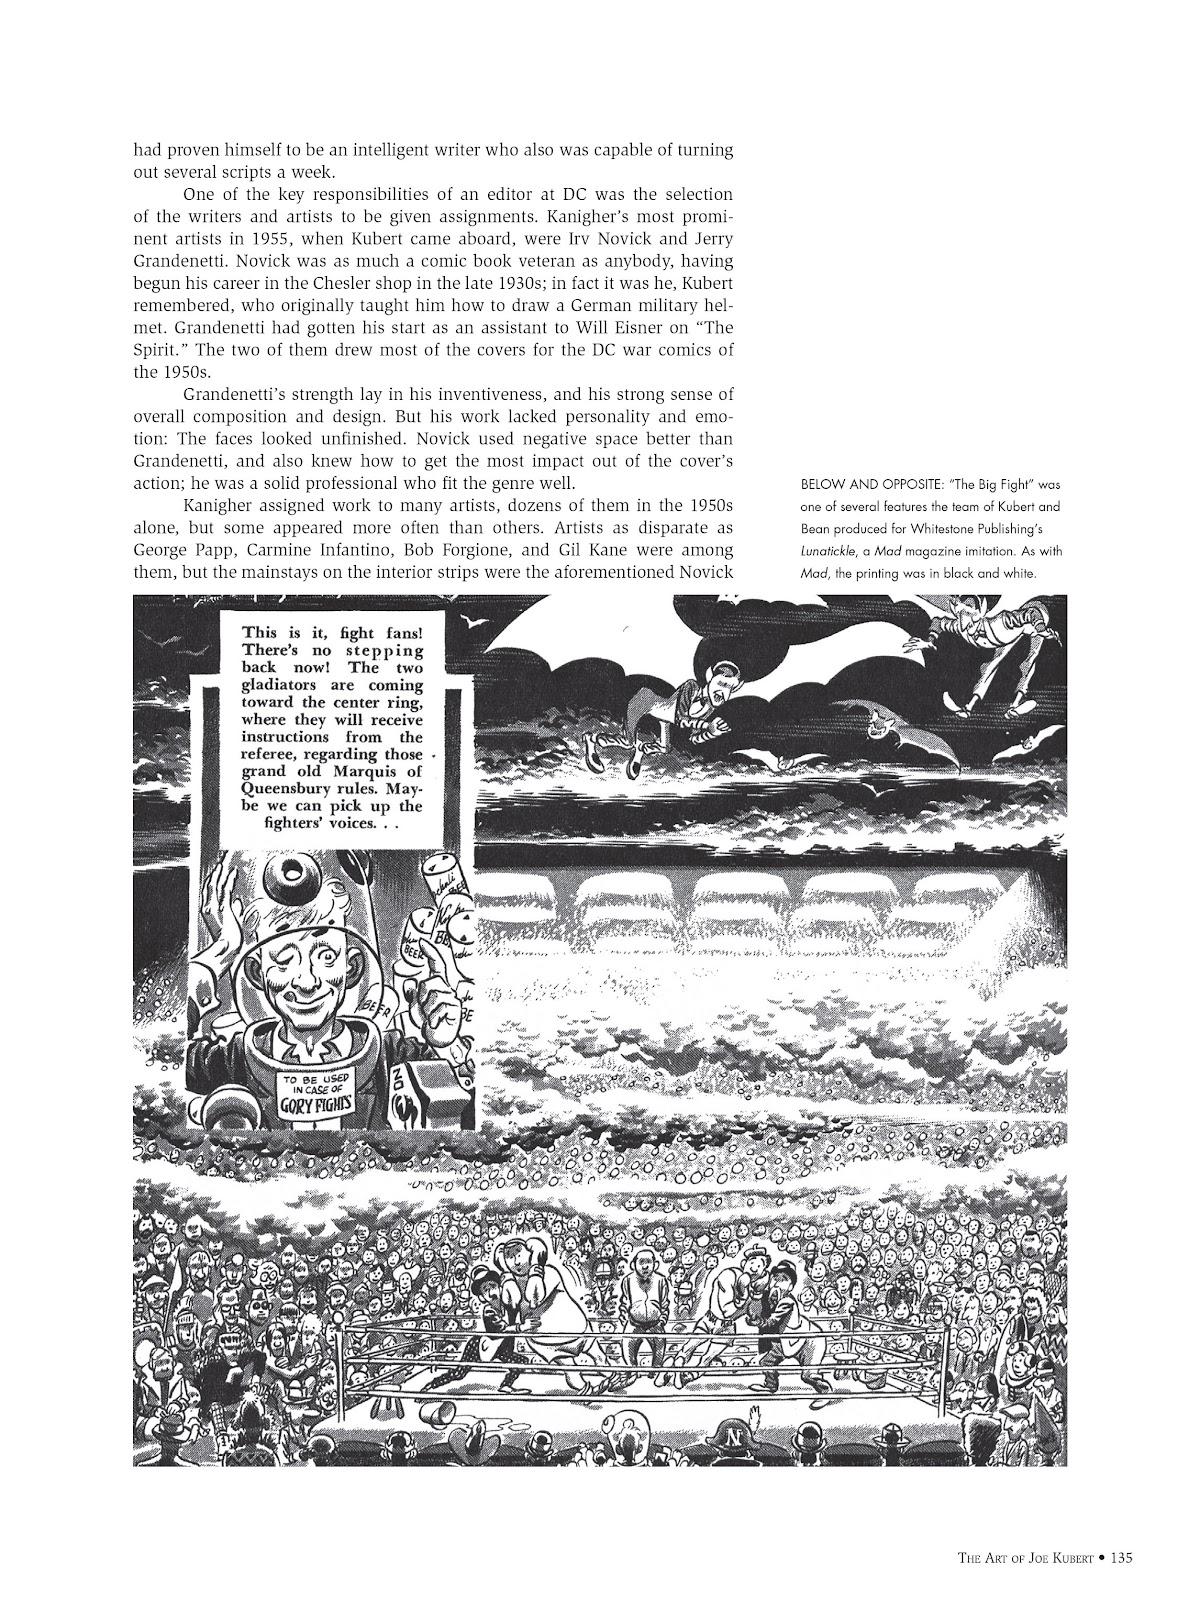 Read online The Art of Joe Kubert comic -  Issue # TPB (Part 2) - 35